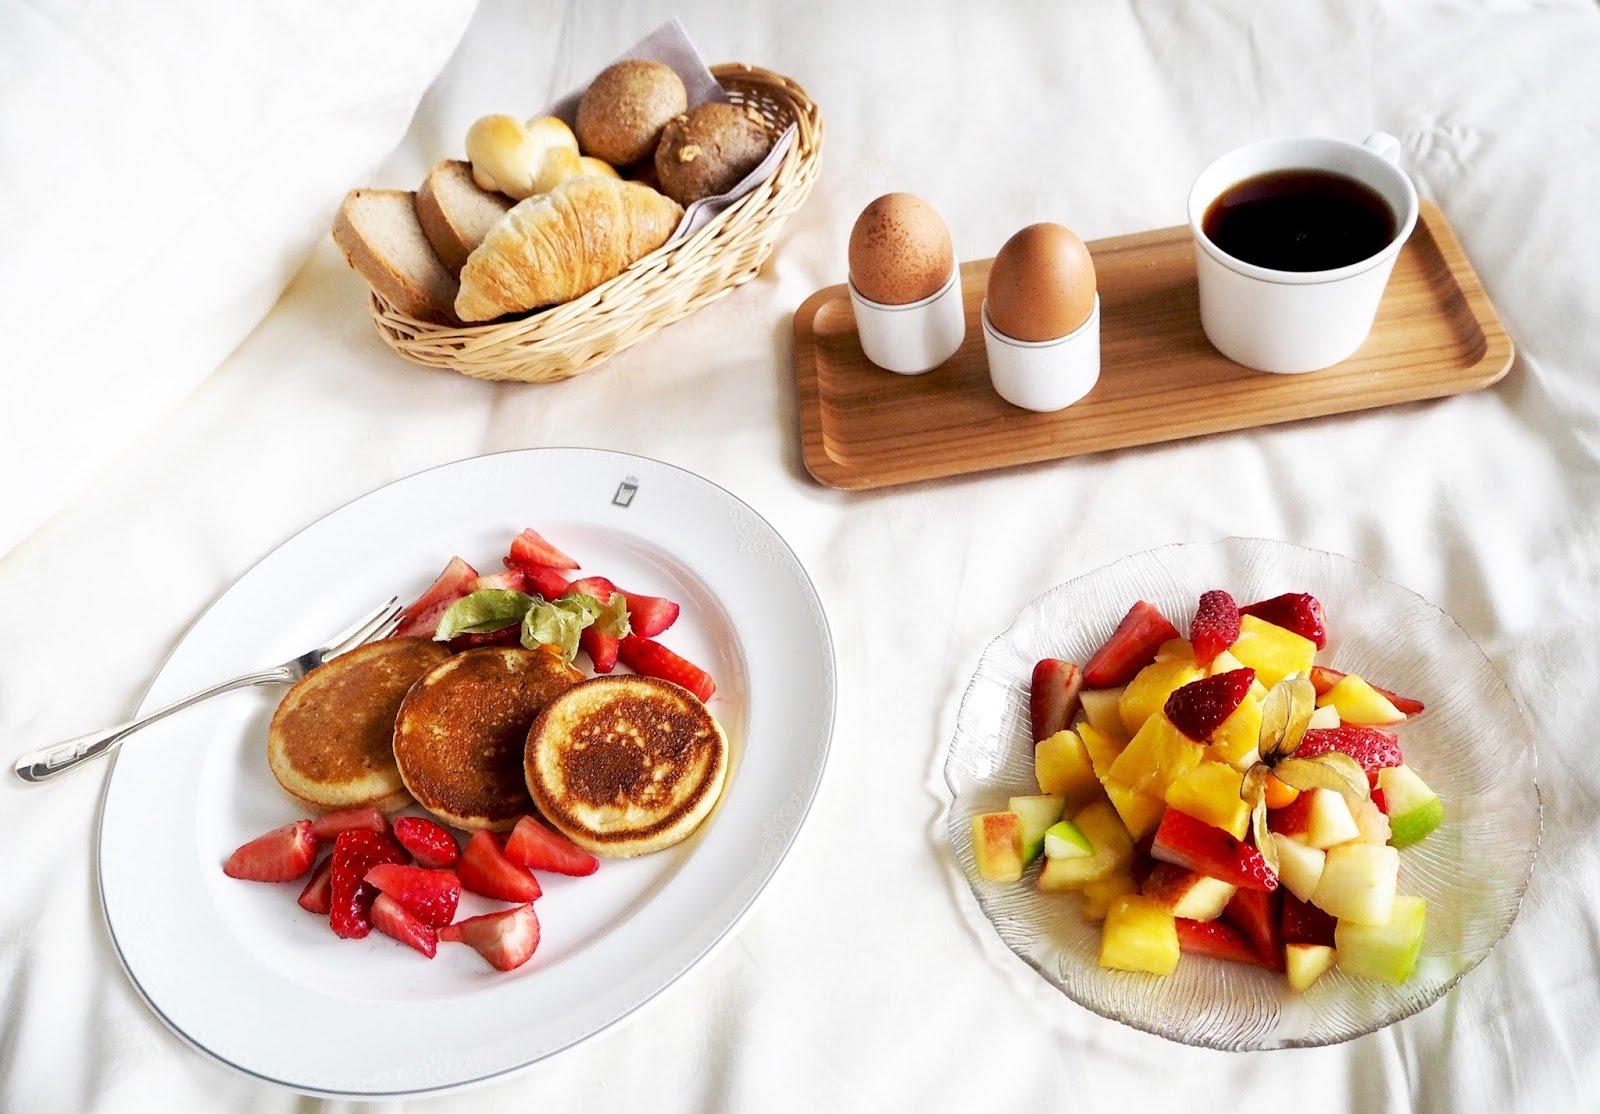 Petit déjeuner hotel